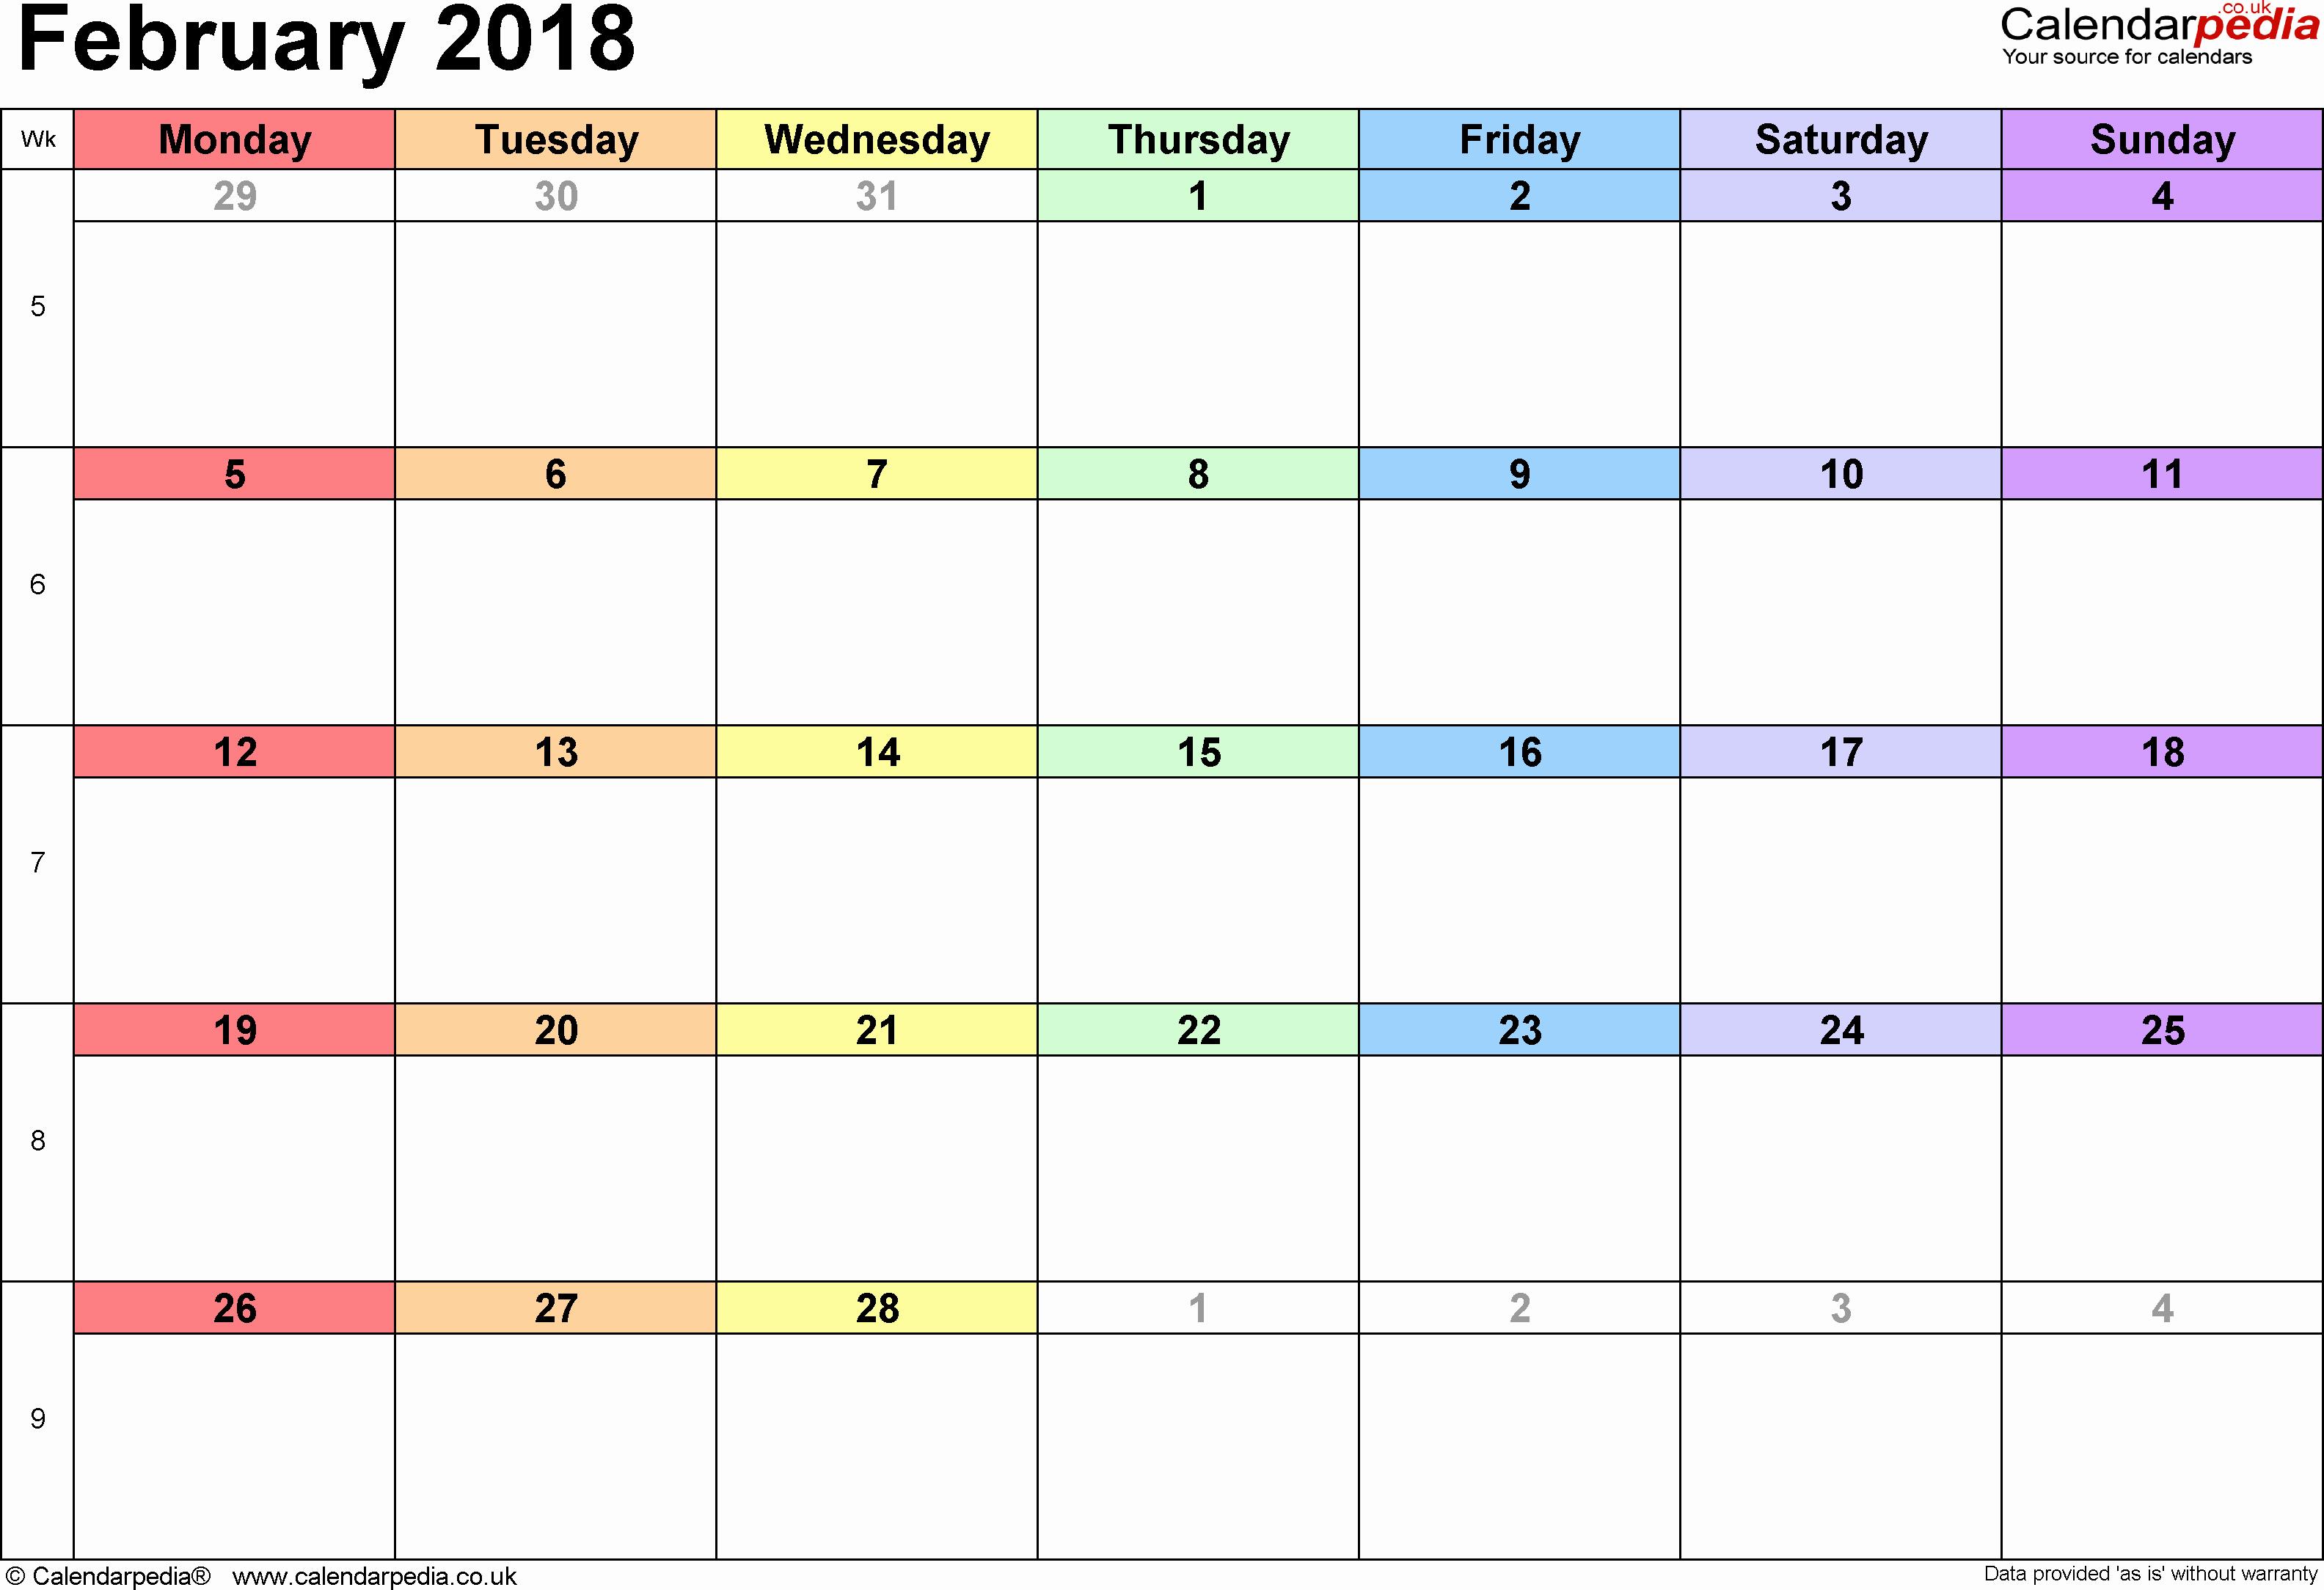 Microsoft Word 2018 Calendar Templates Inspirational February 2018 Calendar Word